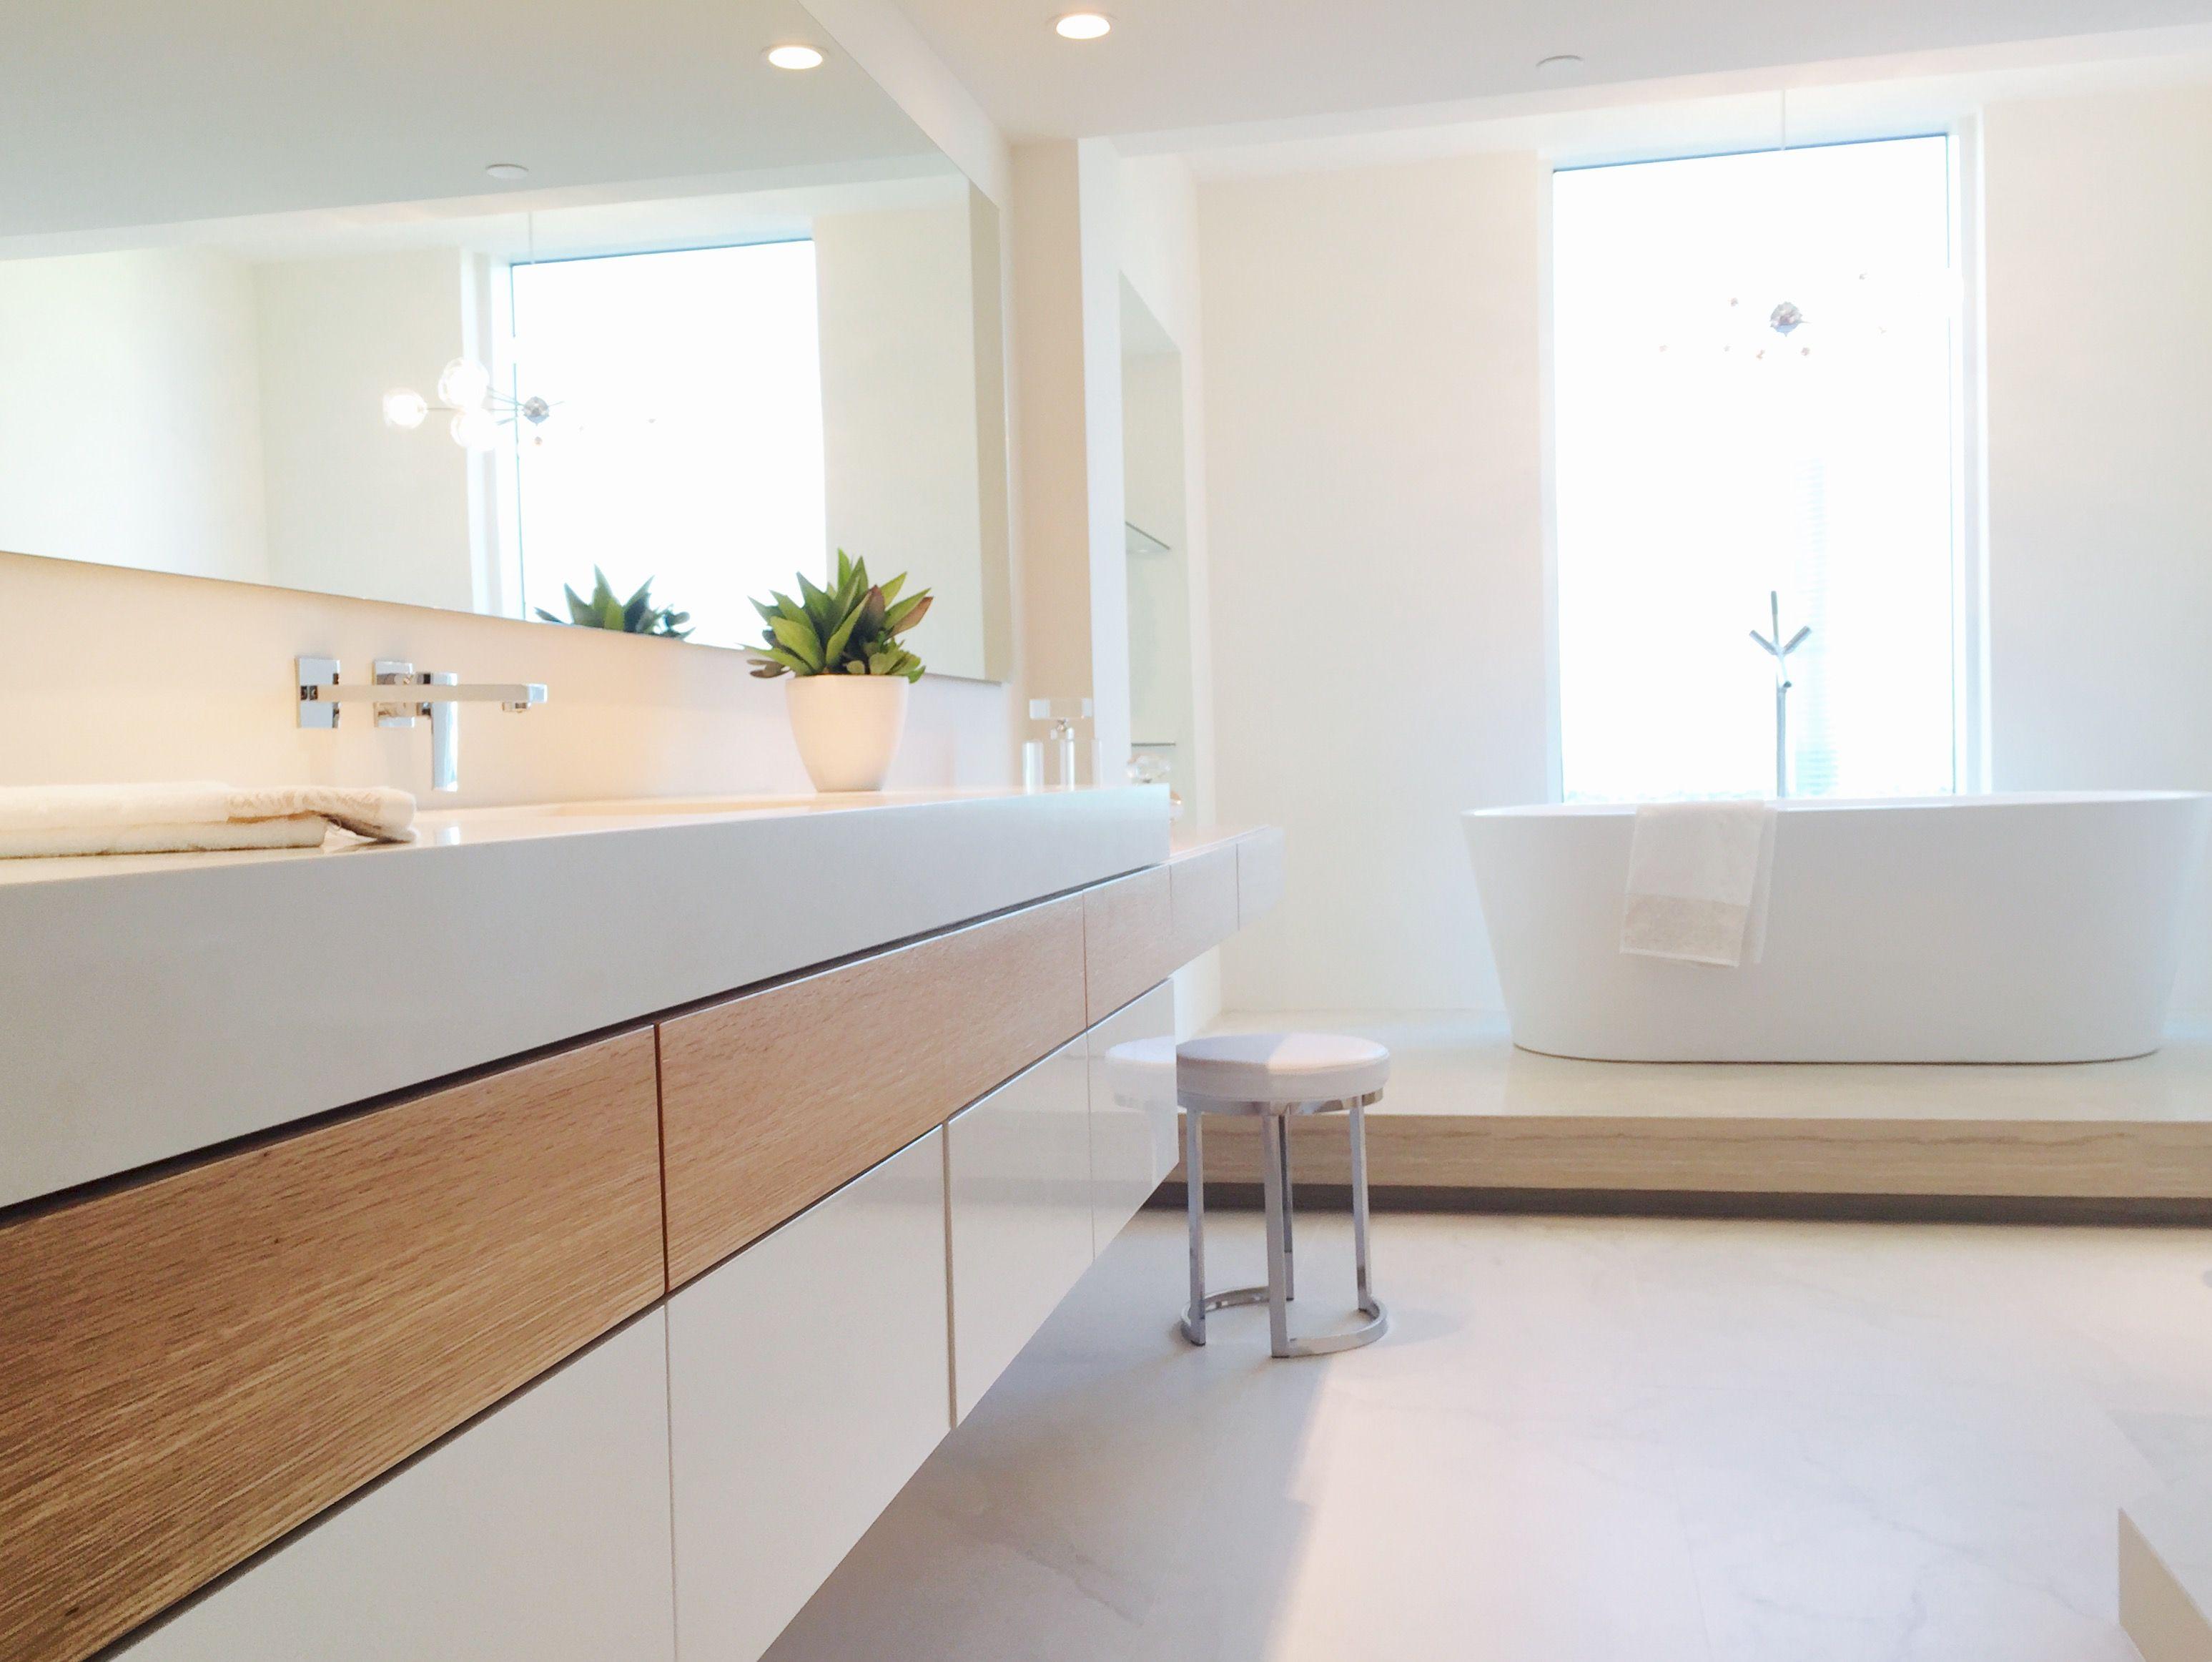 Bathroom Designed Enchanting Luxury Master Bathroom Designedmeredith Marlow Interiors Review